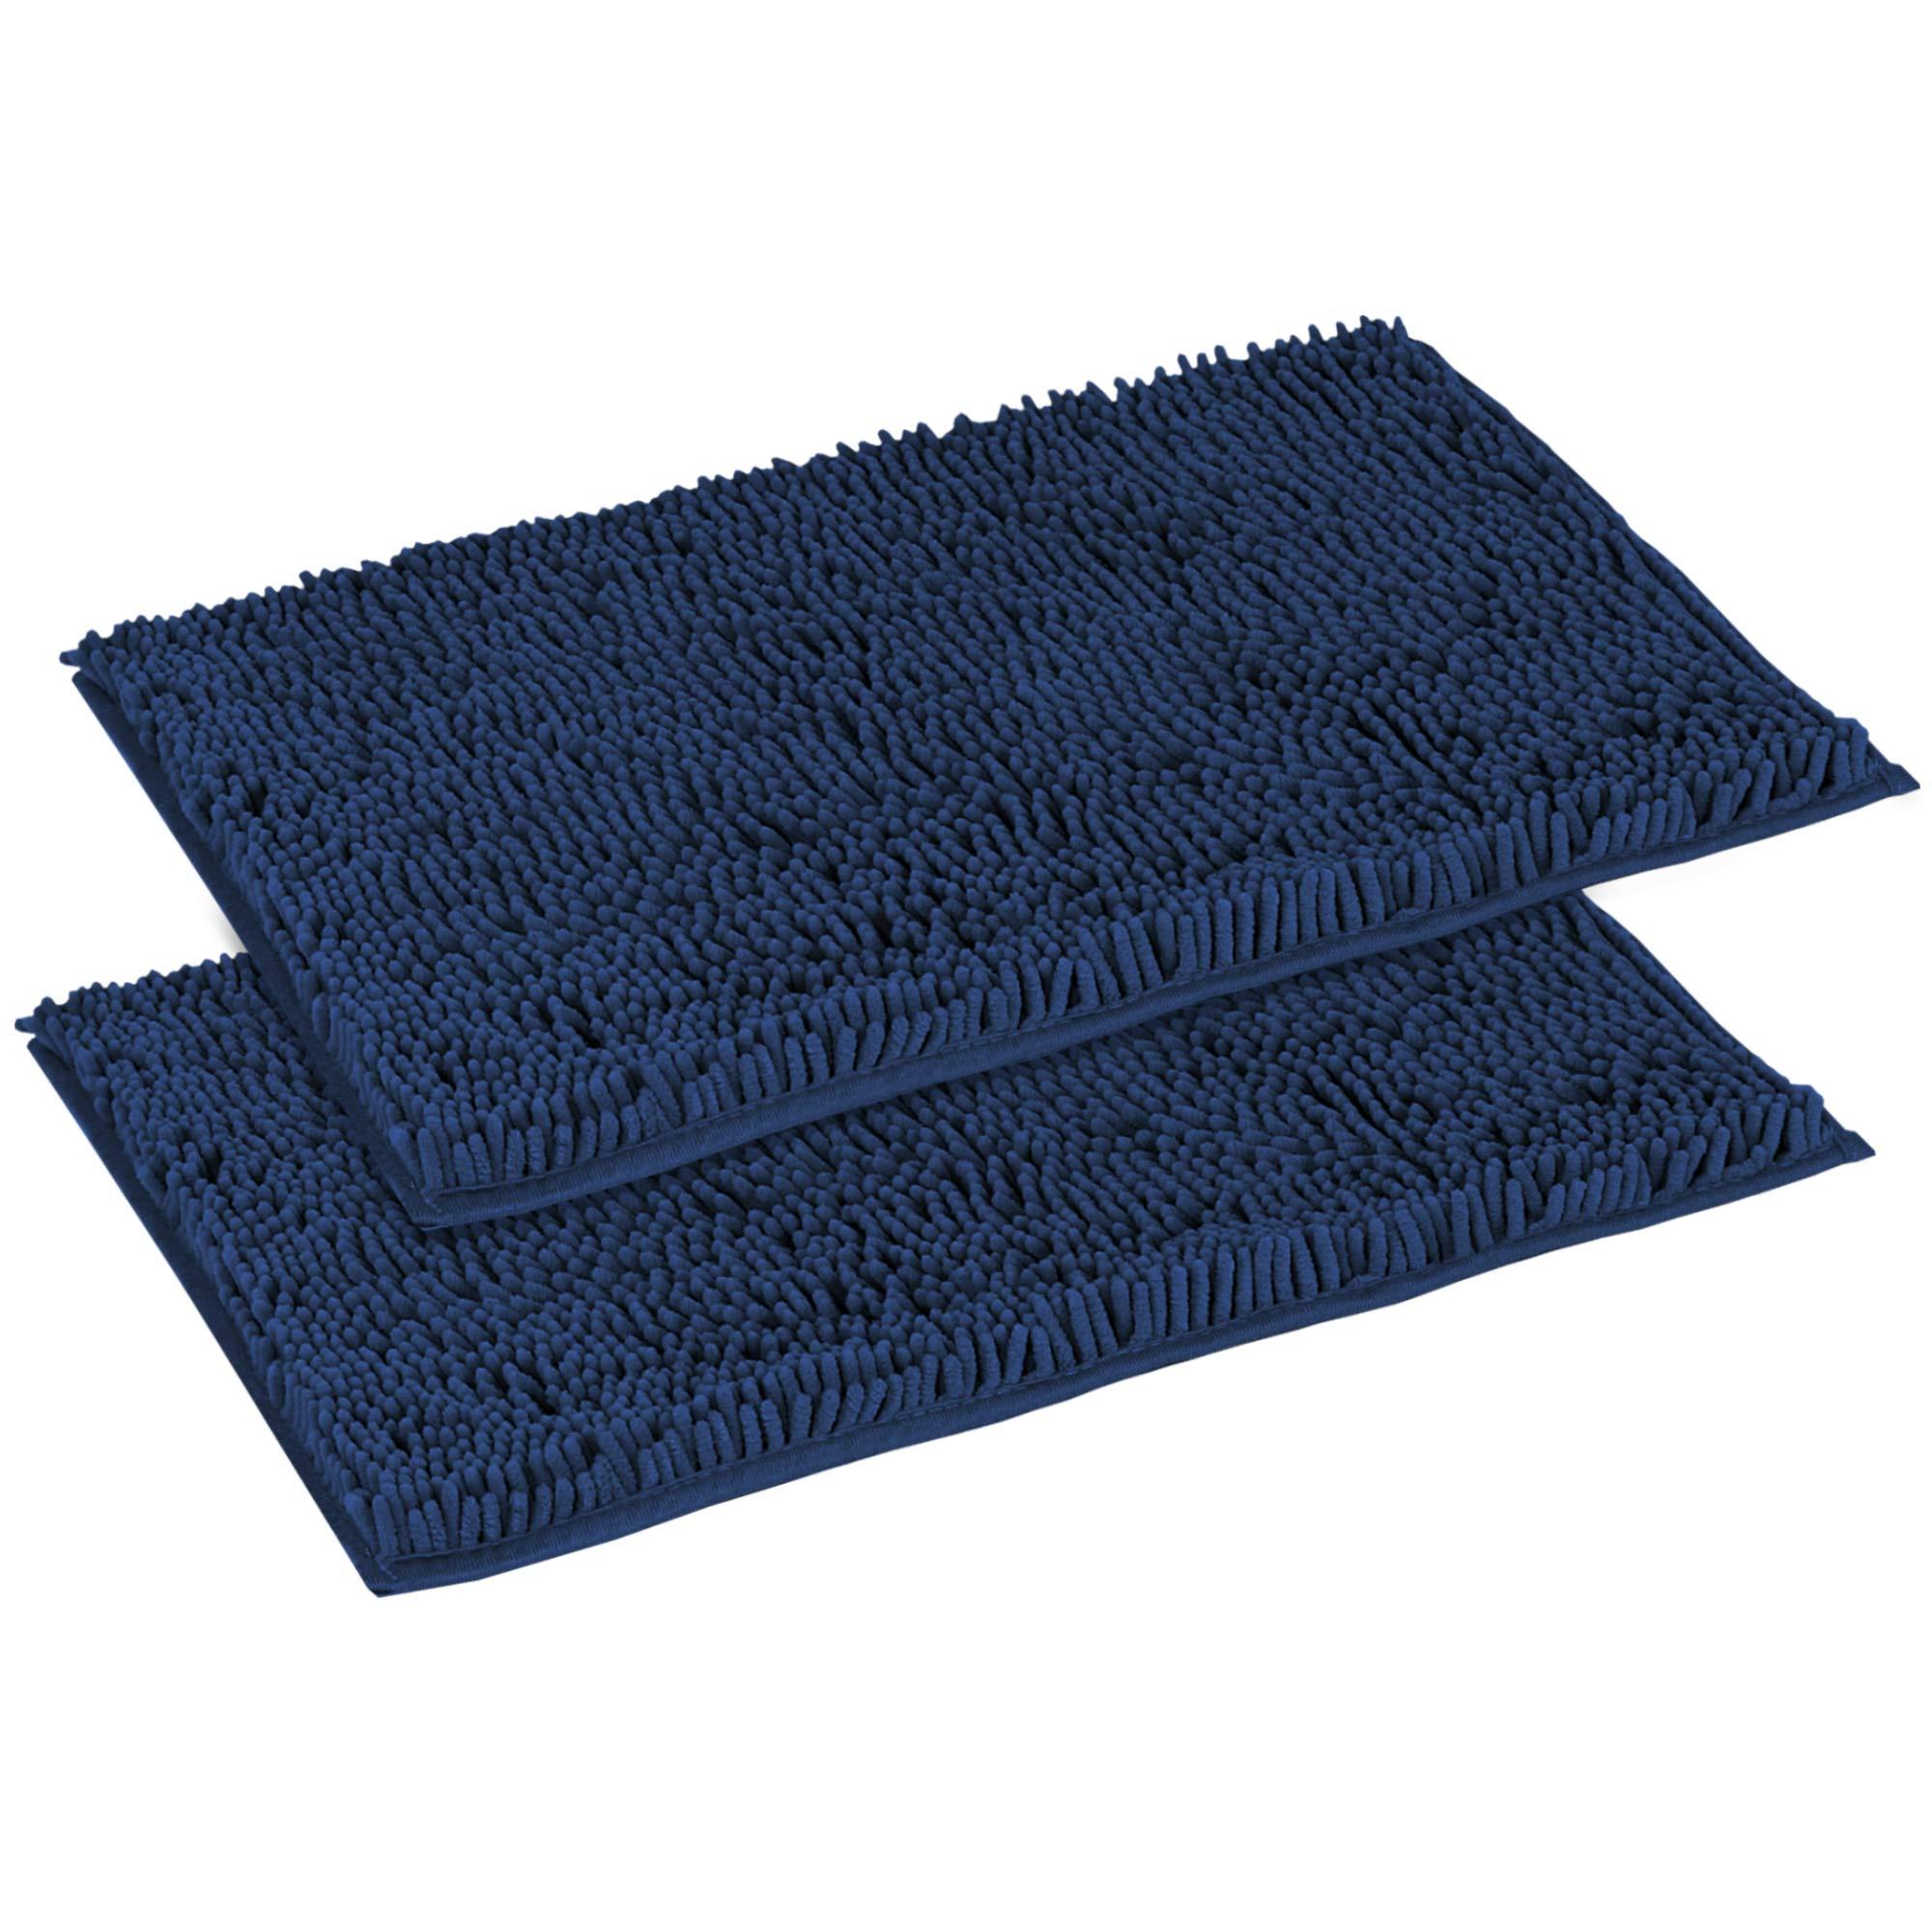 Flamingo P Super Soft Microfiber Bathroom Rugs Non Slip Shag Bath Mat for Kitchen Bedroom, 17''x 24'', Navy, Two Pack